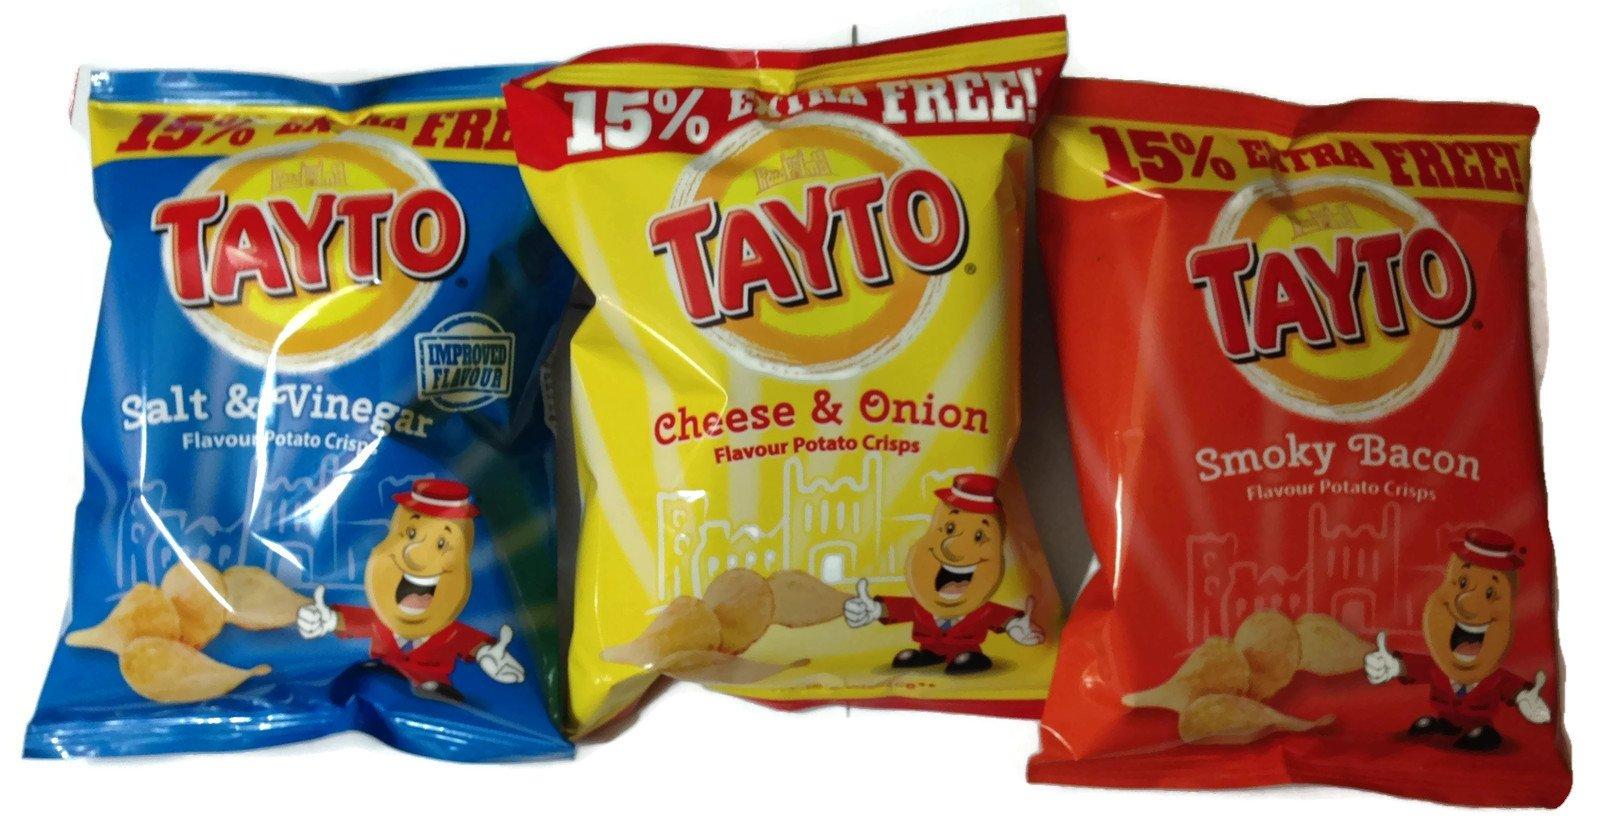 Tayto Irish Assorted Crisps - 12 Pack (12 X 37.5g Bags) - 4 Cheese & Onion, 4 Salt & Vinegar, 4 Smokey Bacon